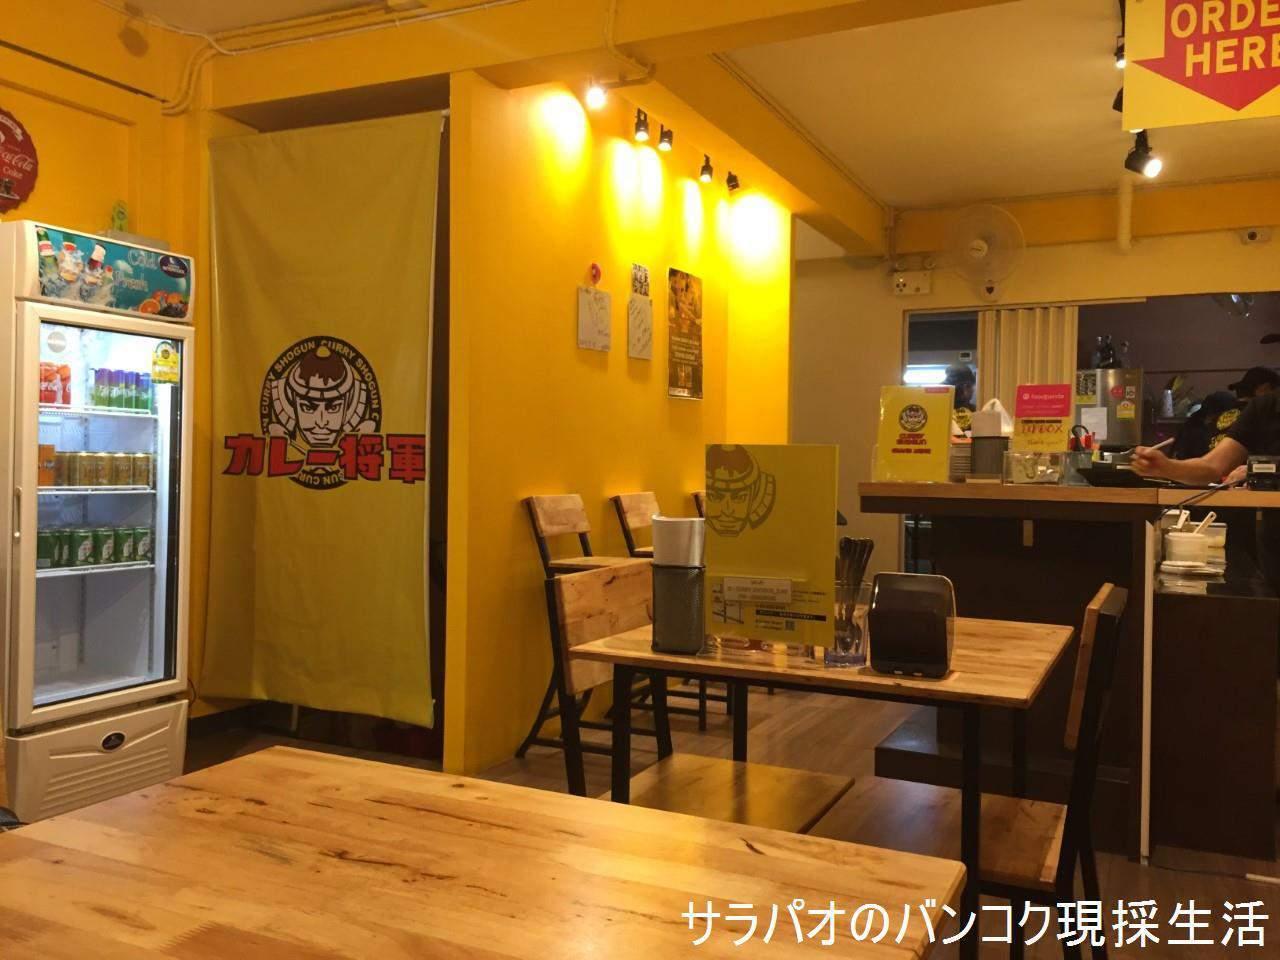 CurryShogun_07.jpg